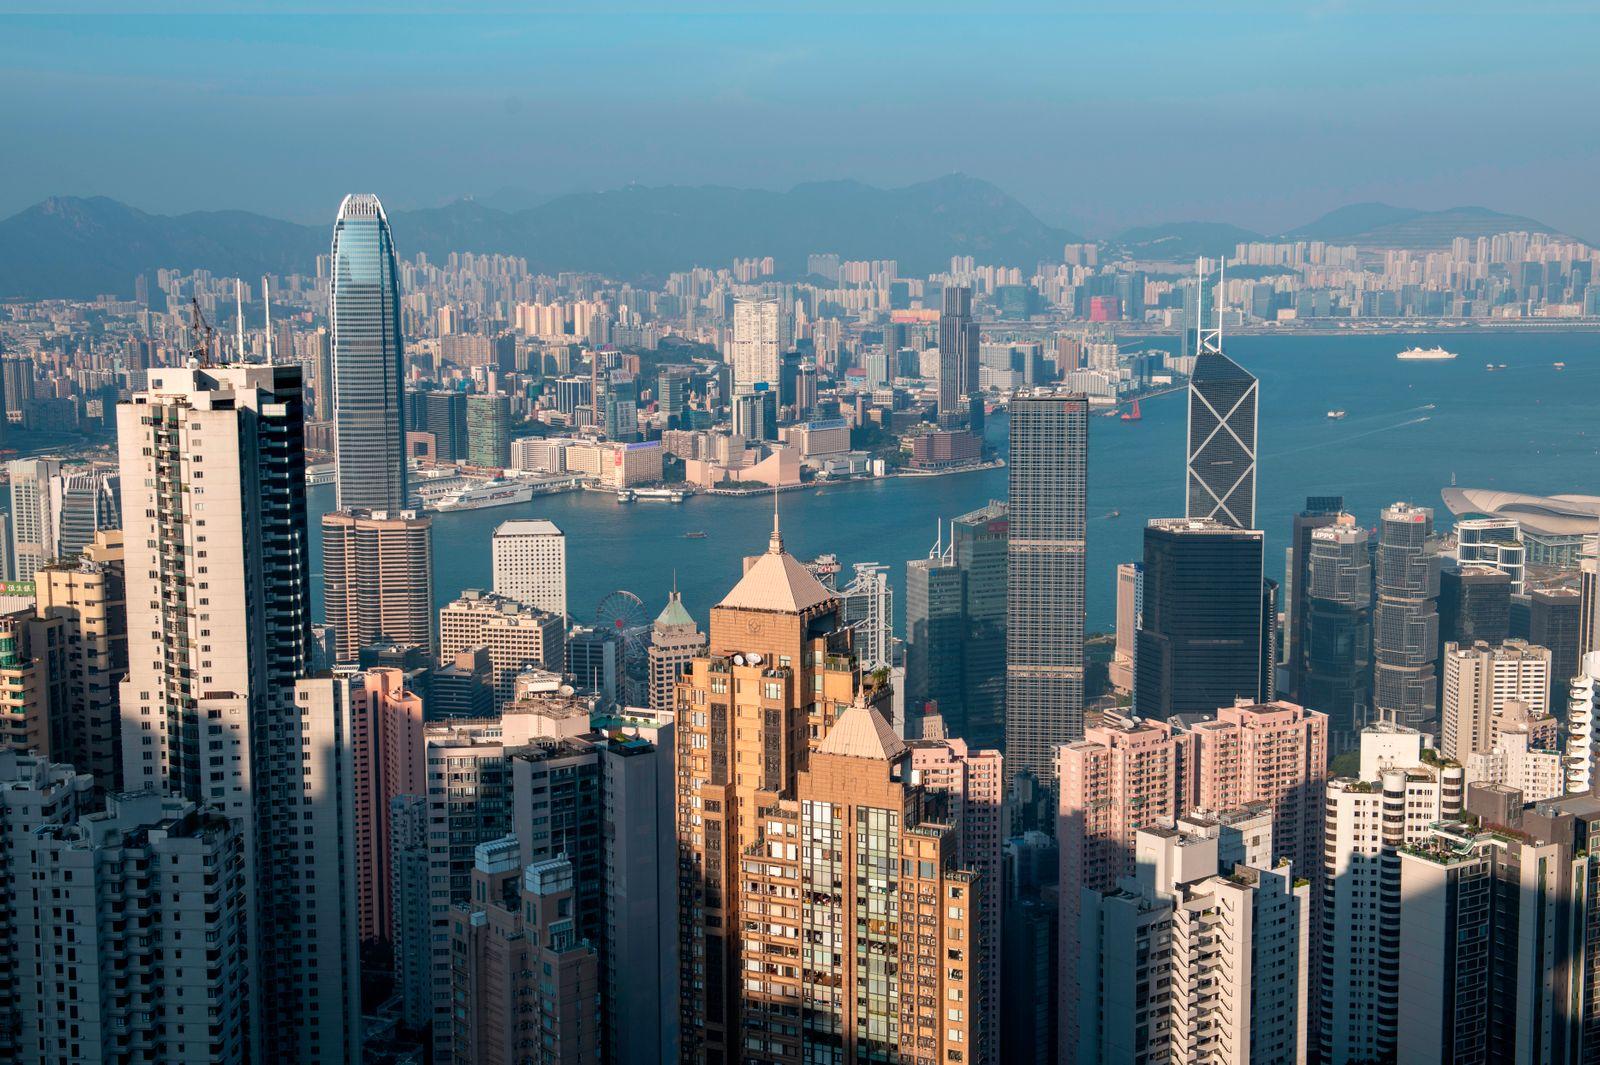 Hong Kong - Economy